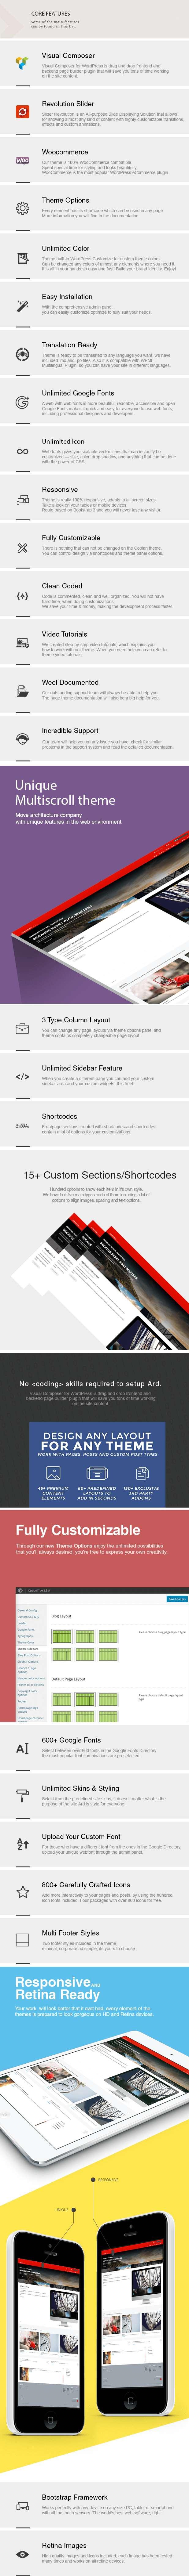 CORPOTERA - Responsive Corporate Business WordPress Theme - 4